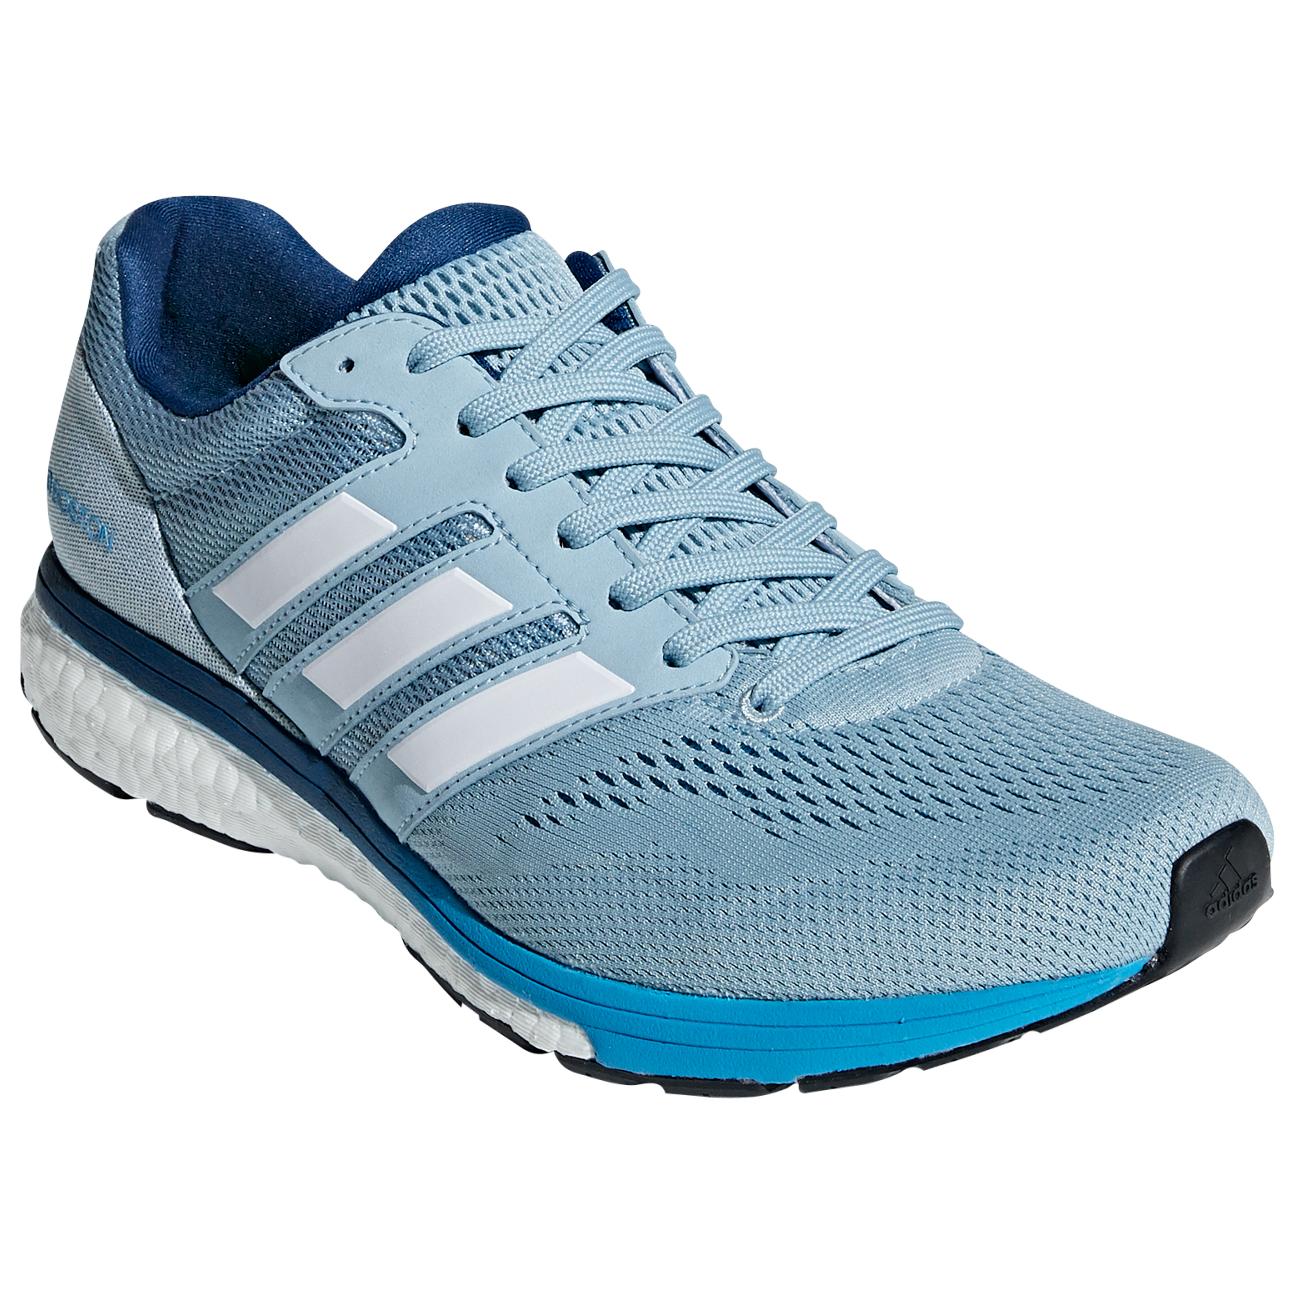 hot sale online 5ea8b 34ef2 adidas - Adizero Boston 7 - Runningschuhe ...